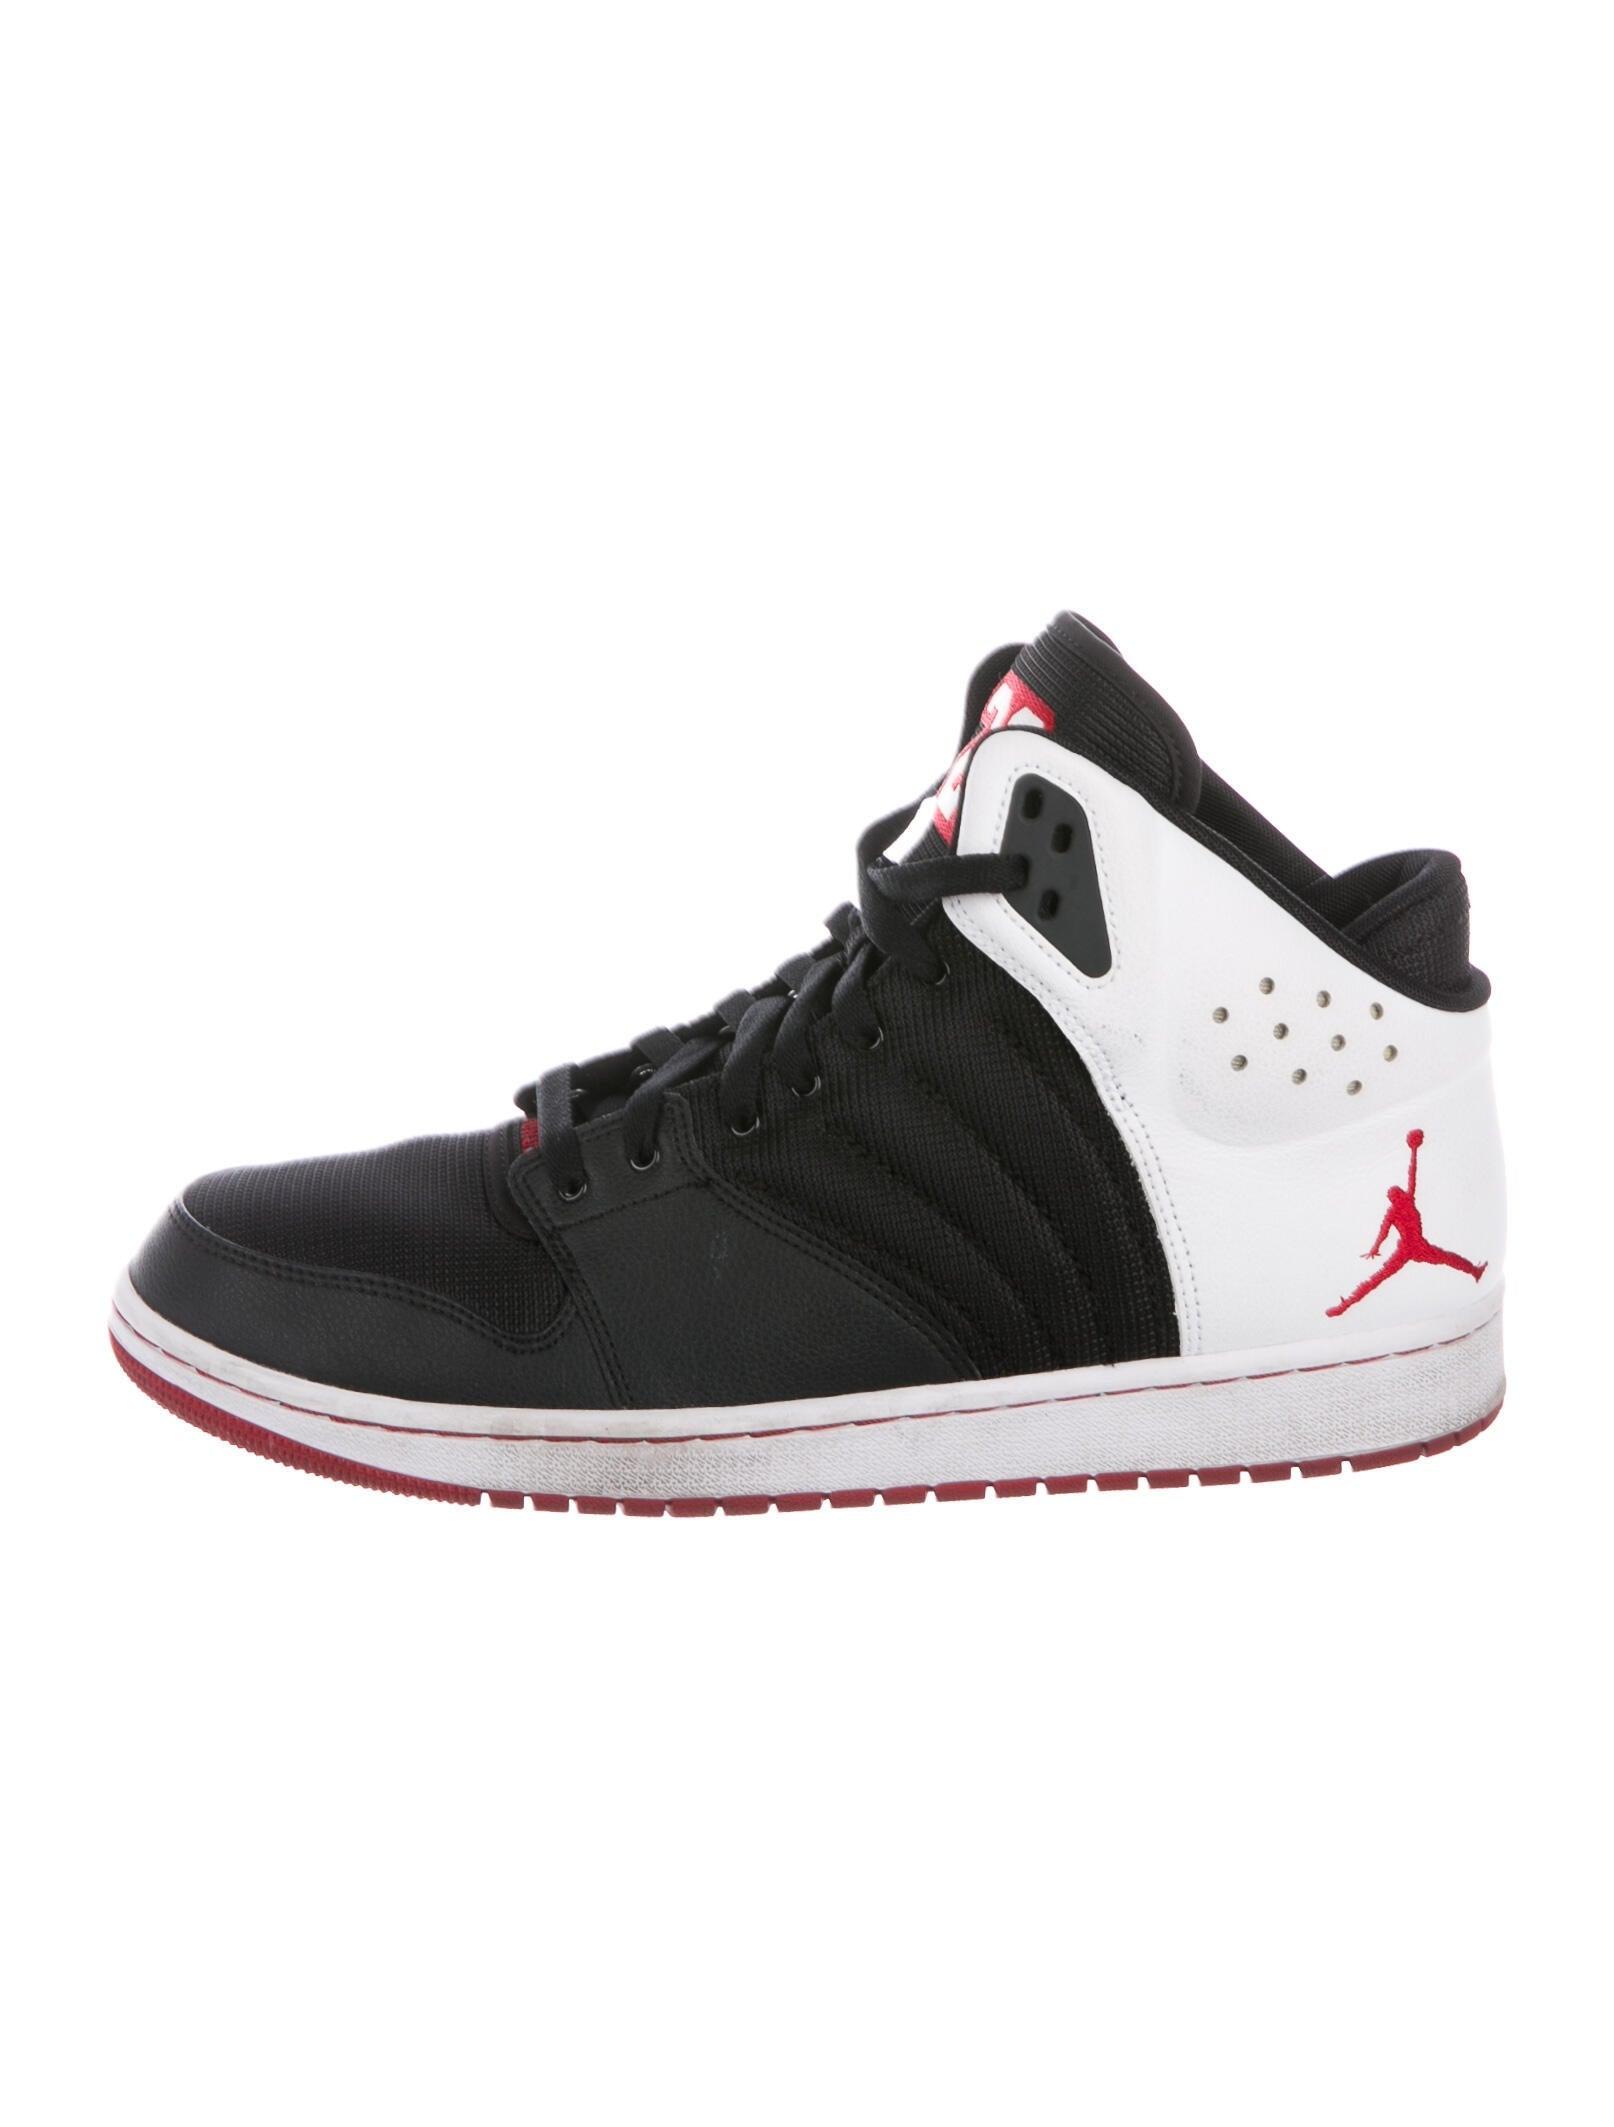 Jordan 1 Flight 4 Sneakers - Black Sneakers, Shoes - WJORA32607 ...